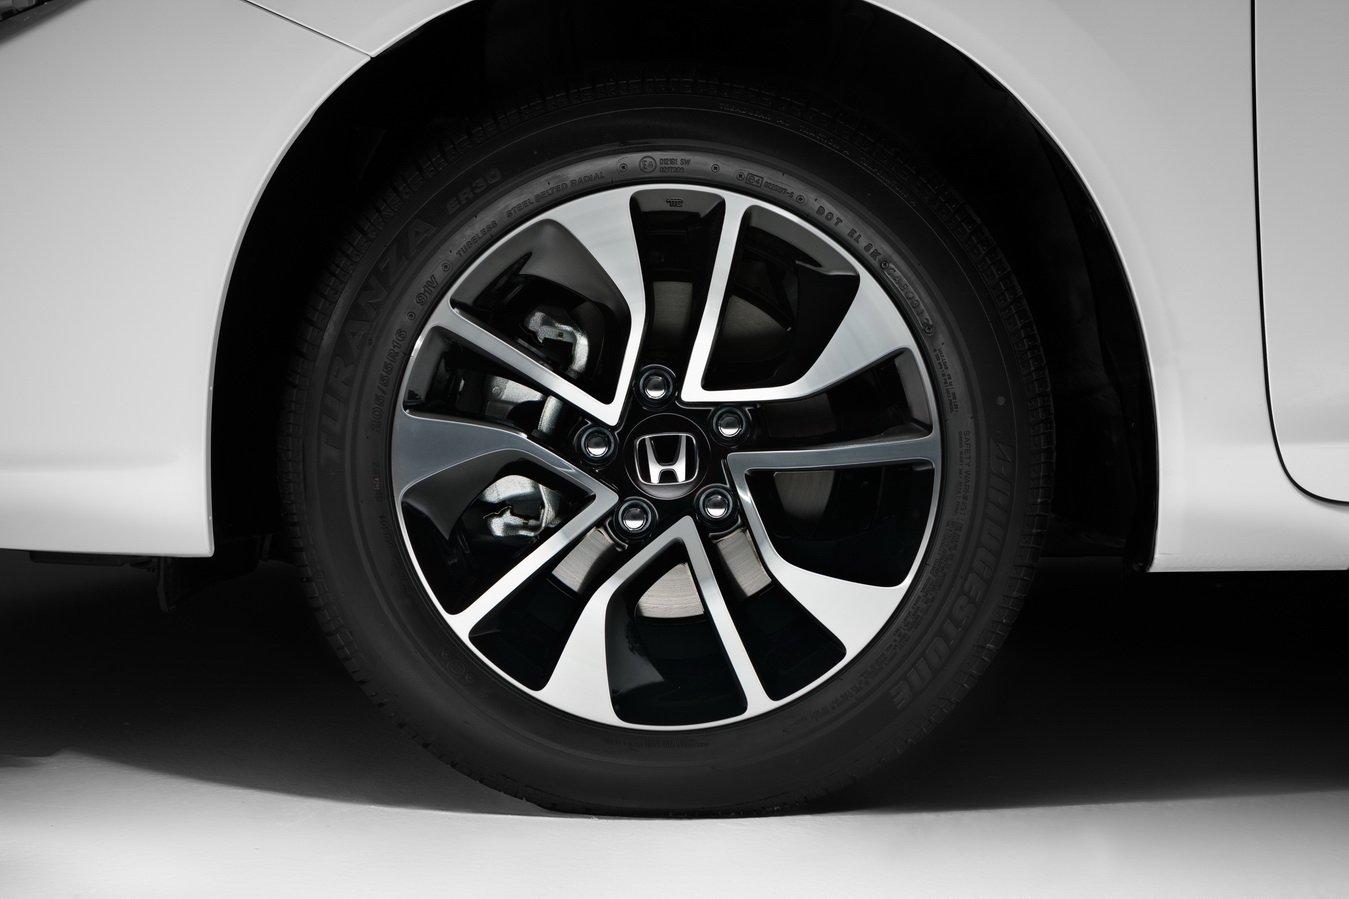 Шиномонтаж, ремонт колес, балансировка в хонда сервисе